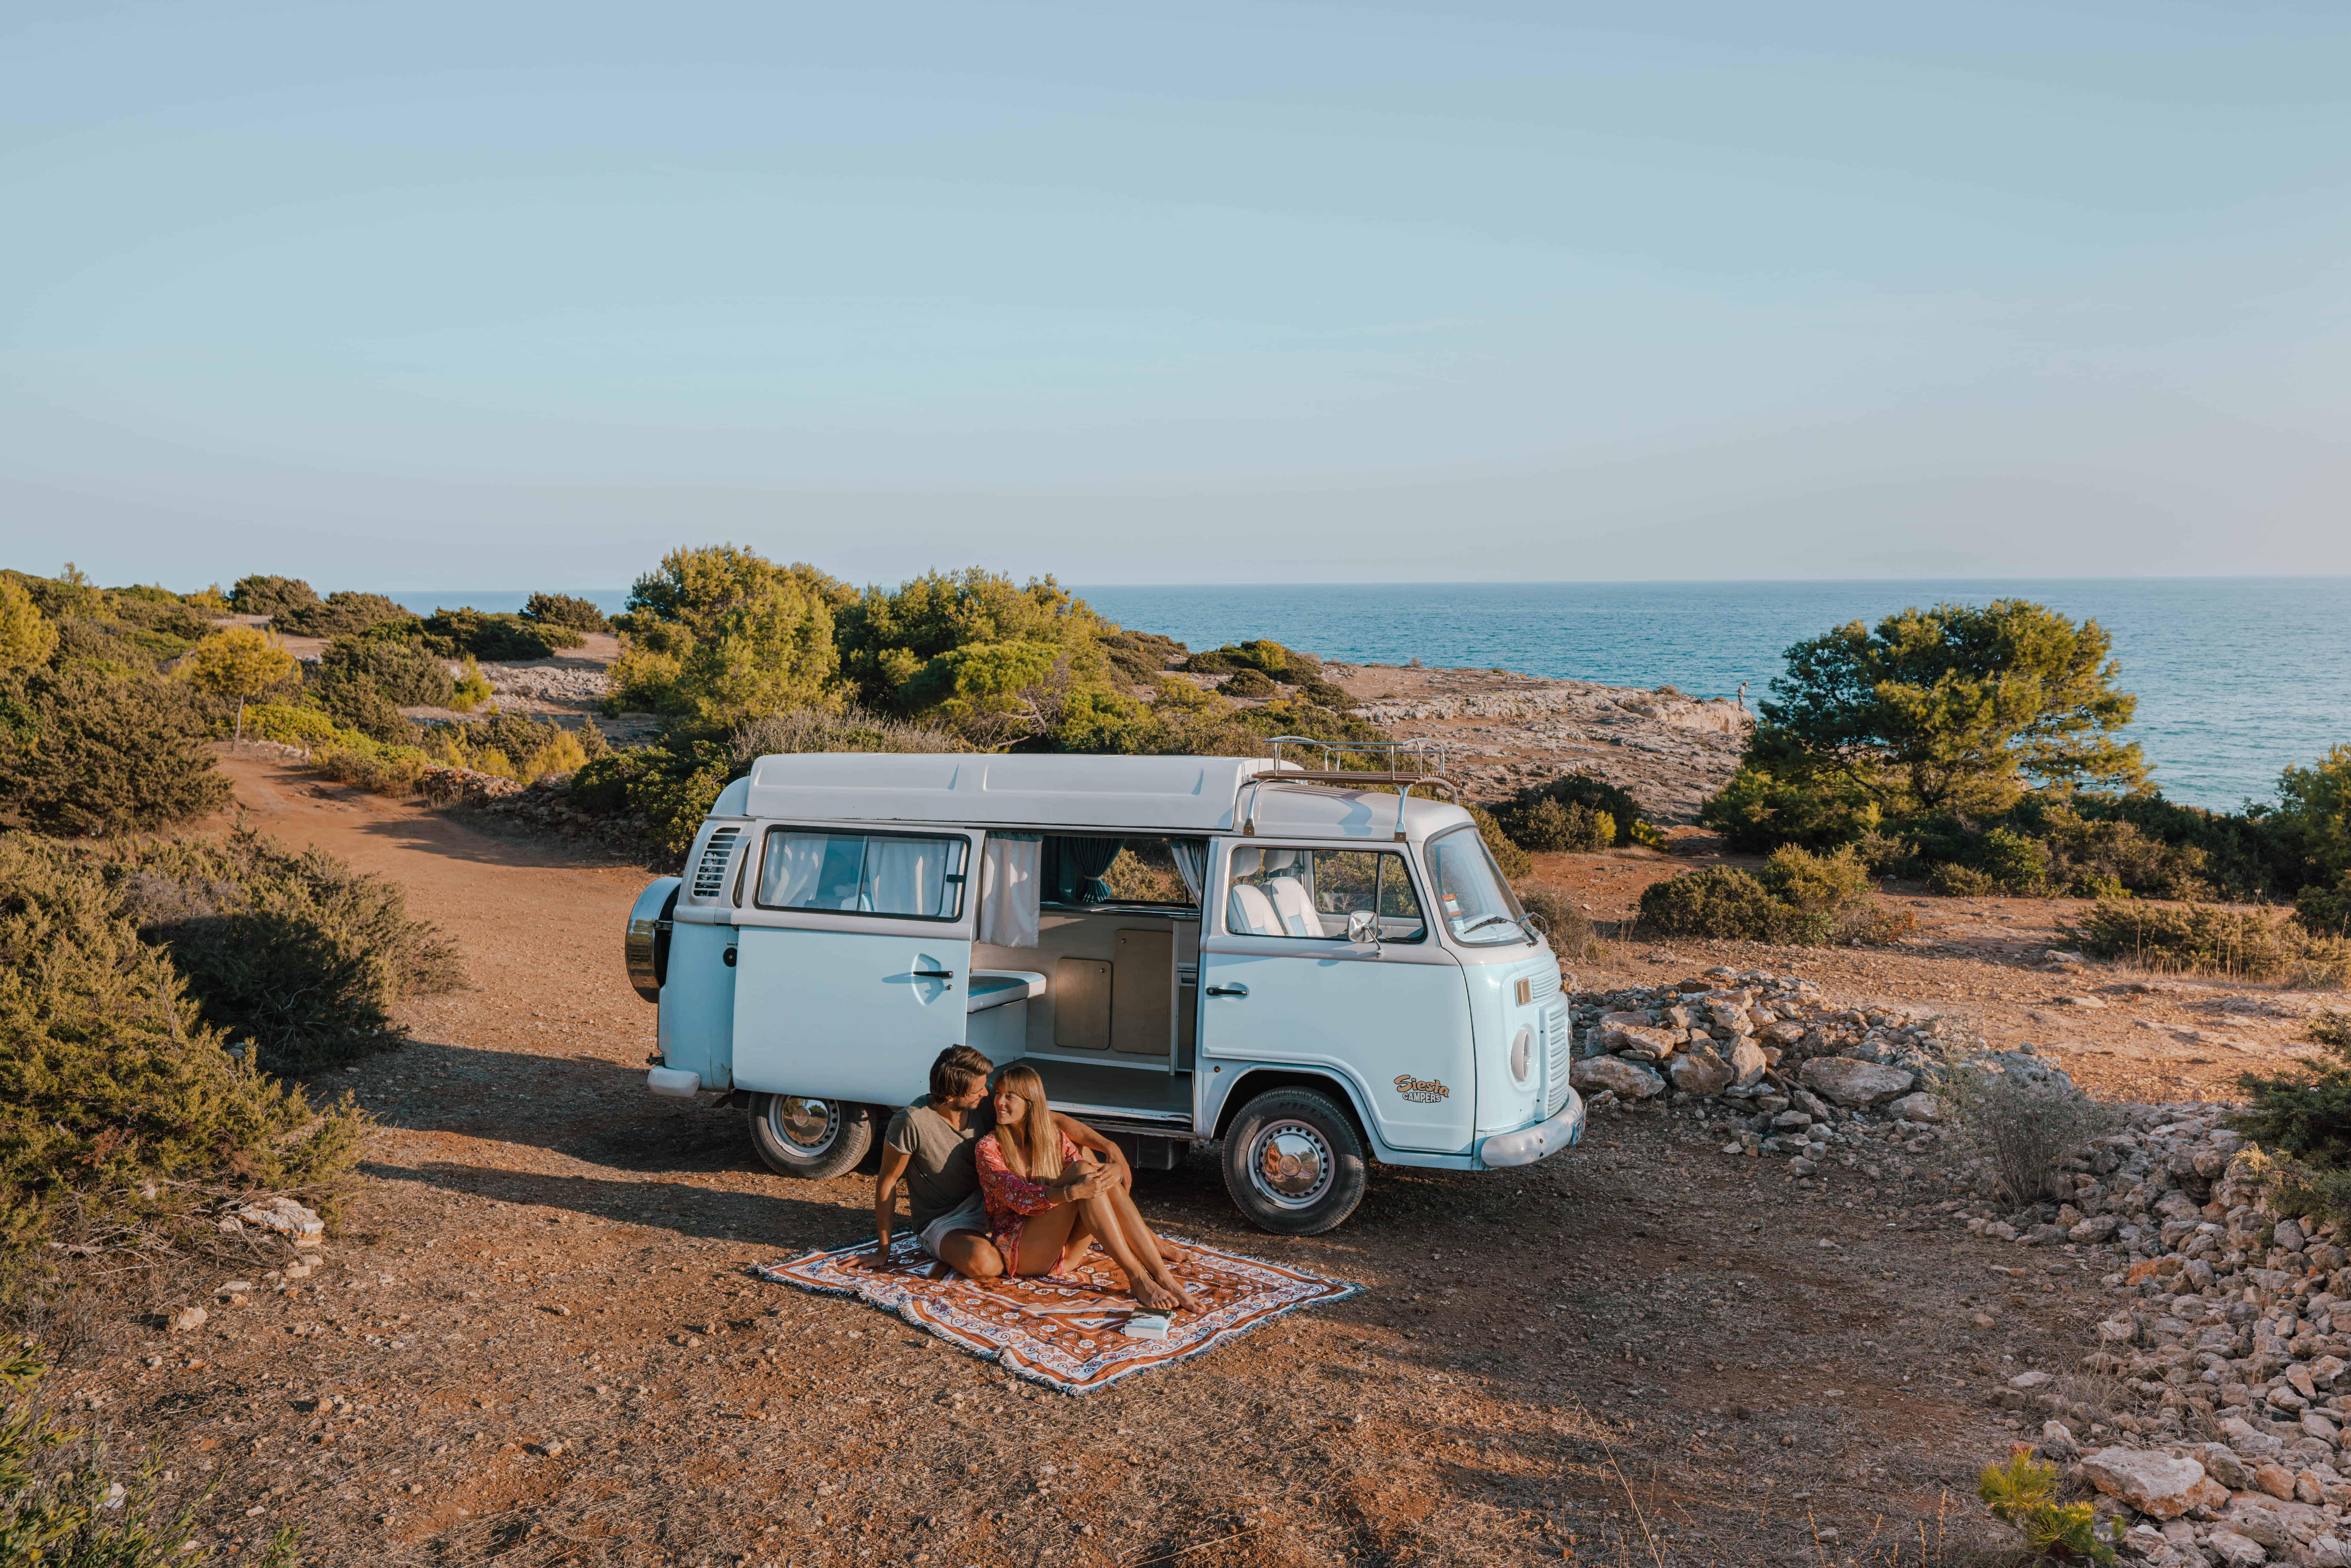 Portugal Algarve Van Life VW Bully Couple